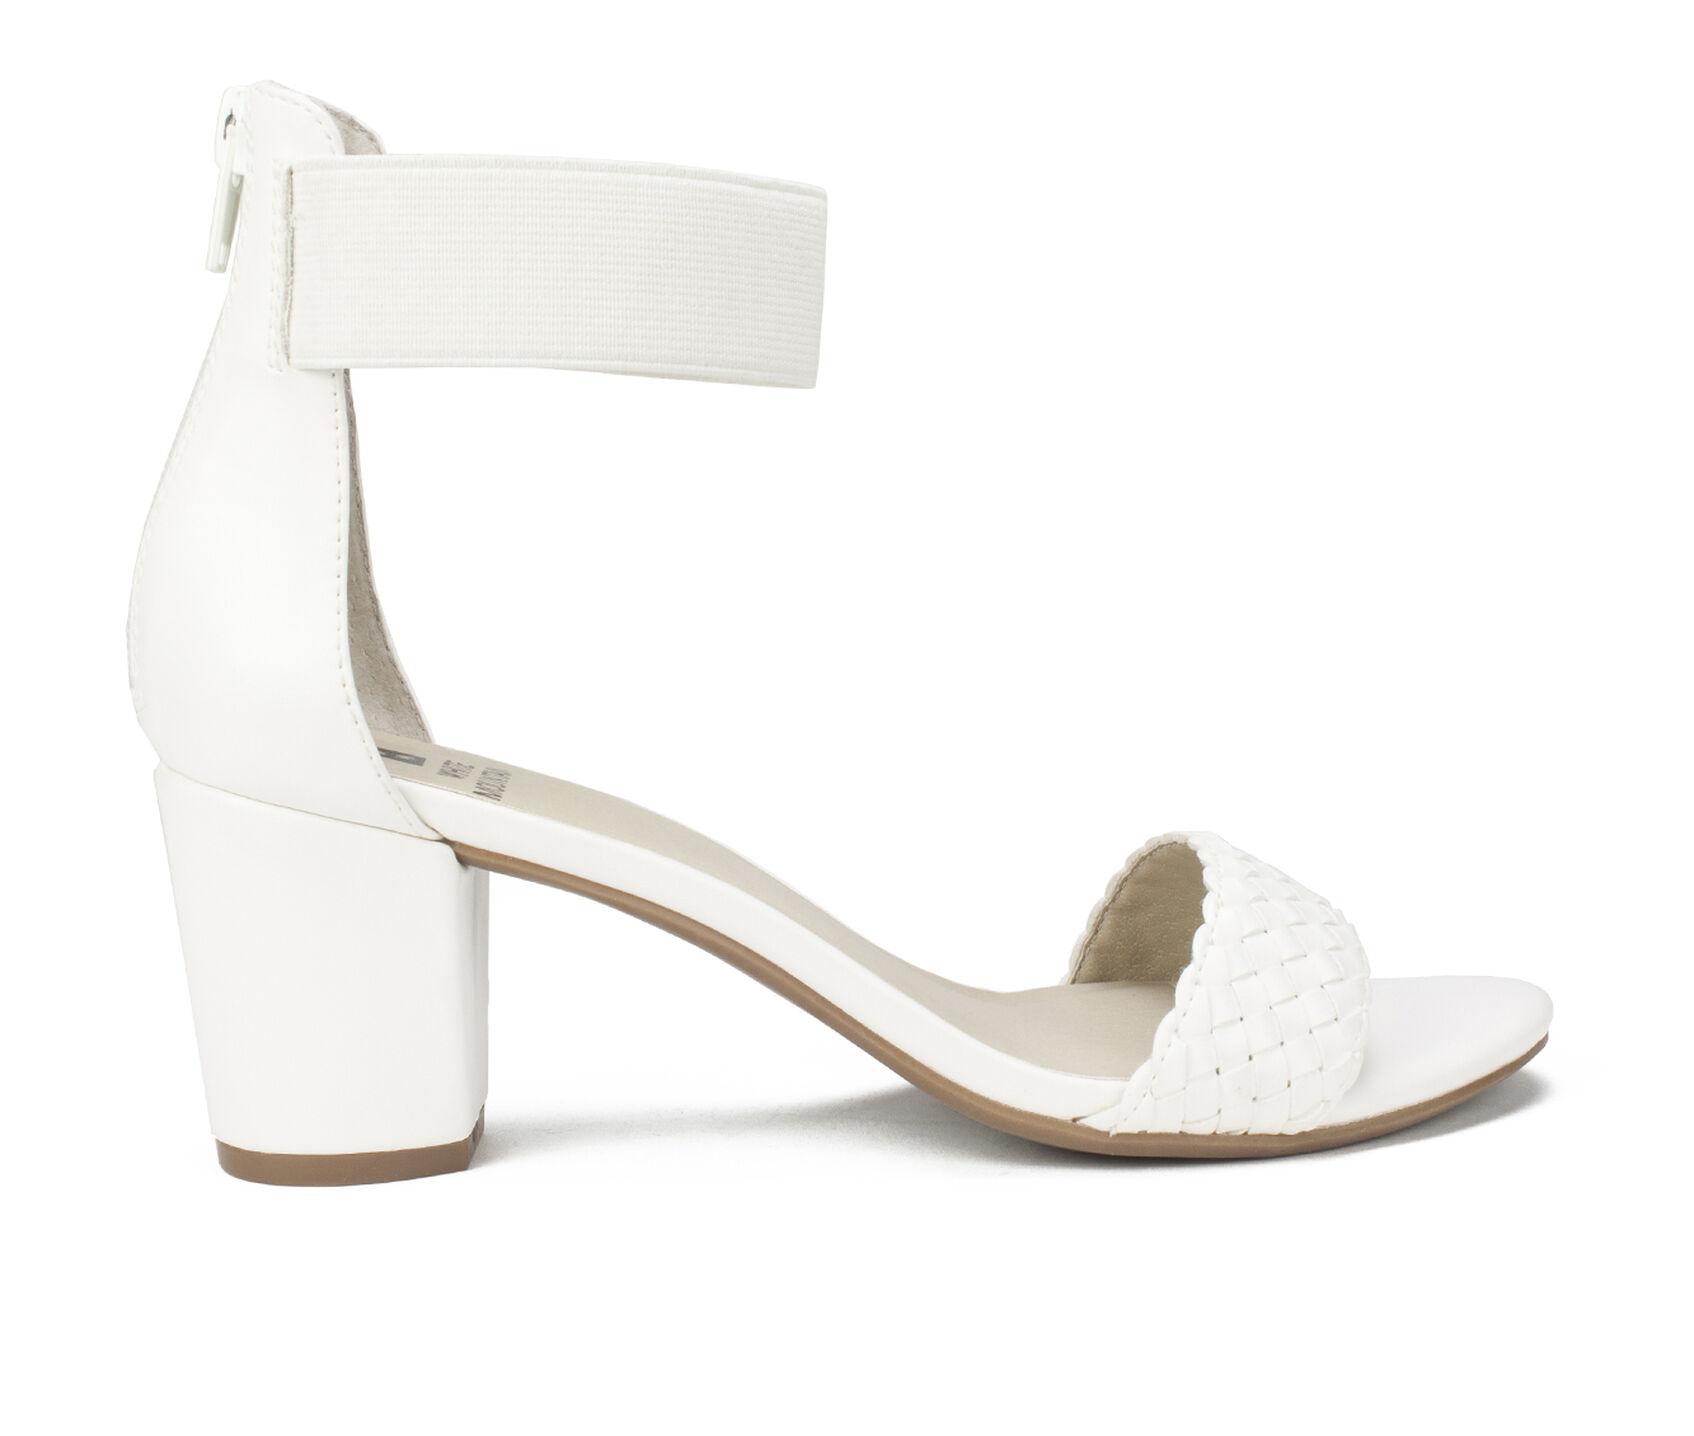 32bbcd46f13 Women's White Mountain Eryn Dress Sandals